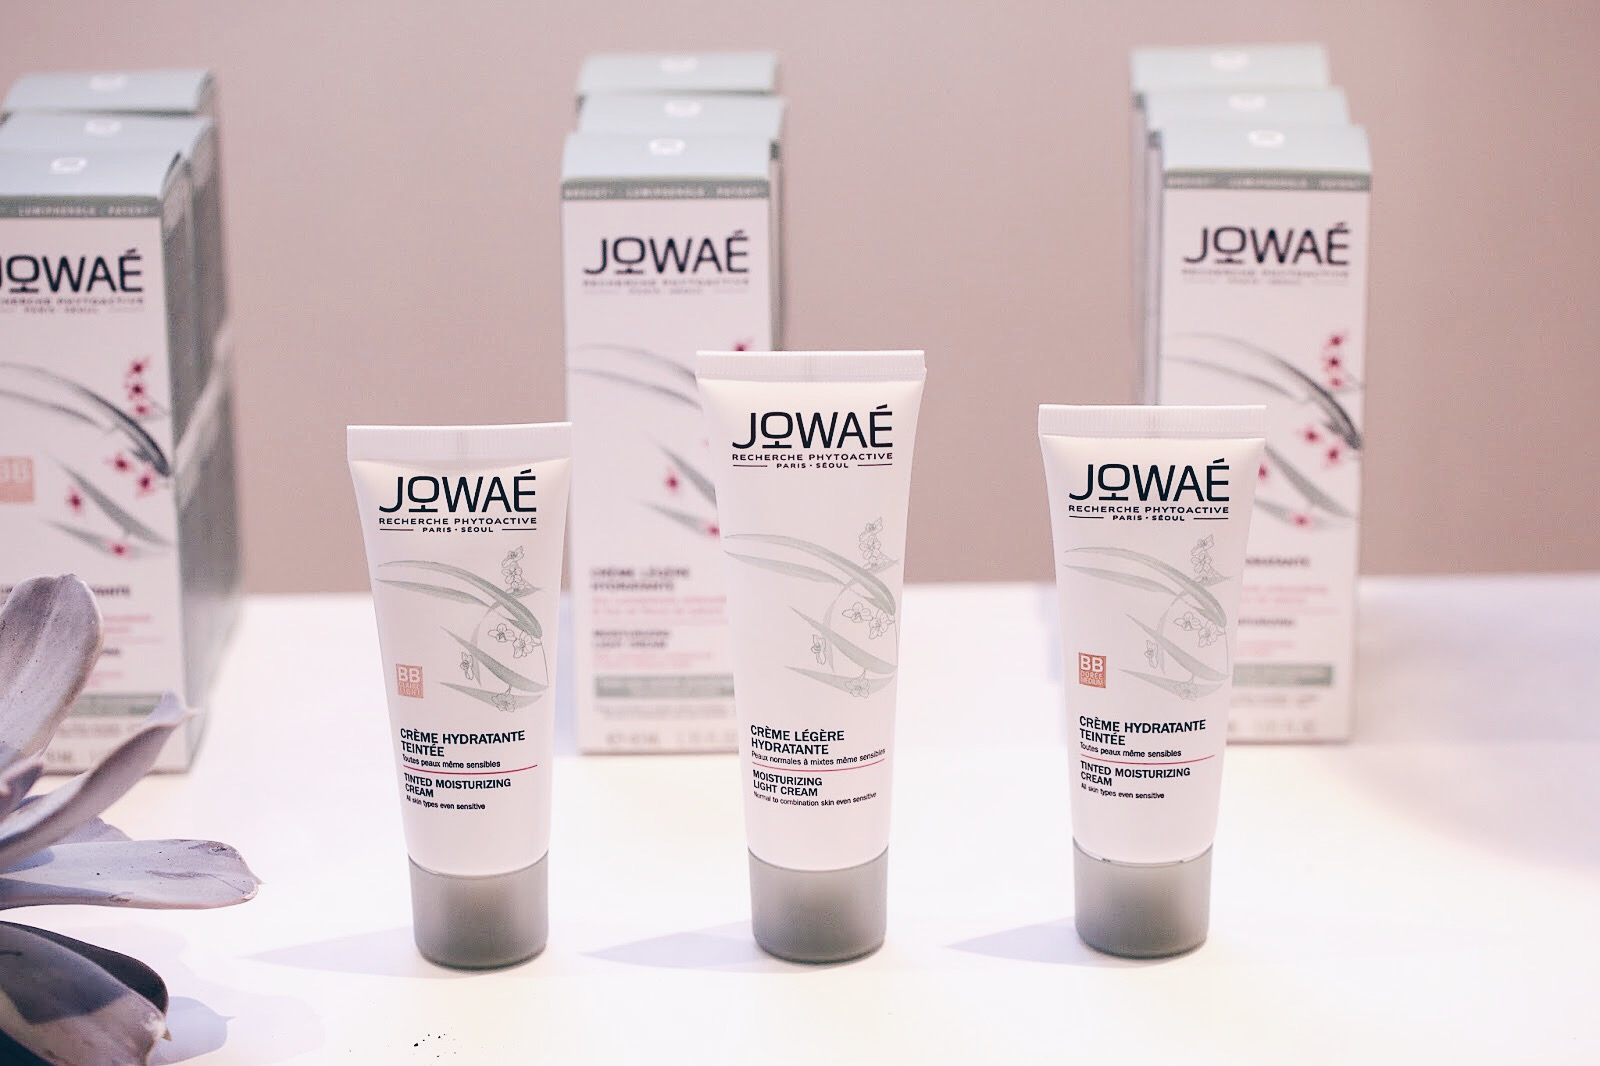 cosmetique jowae